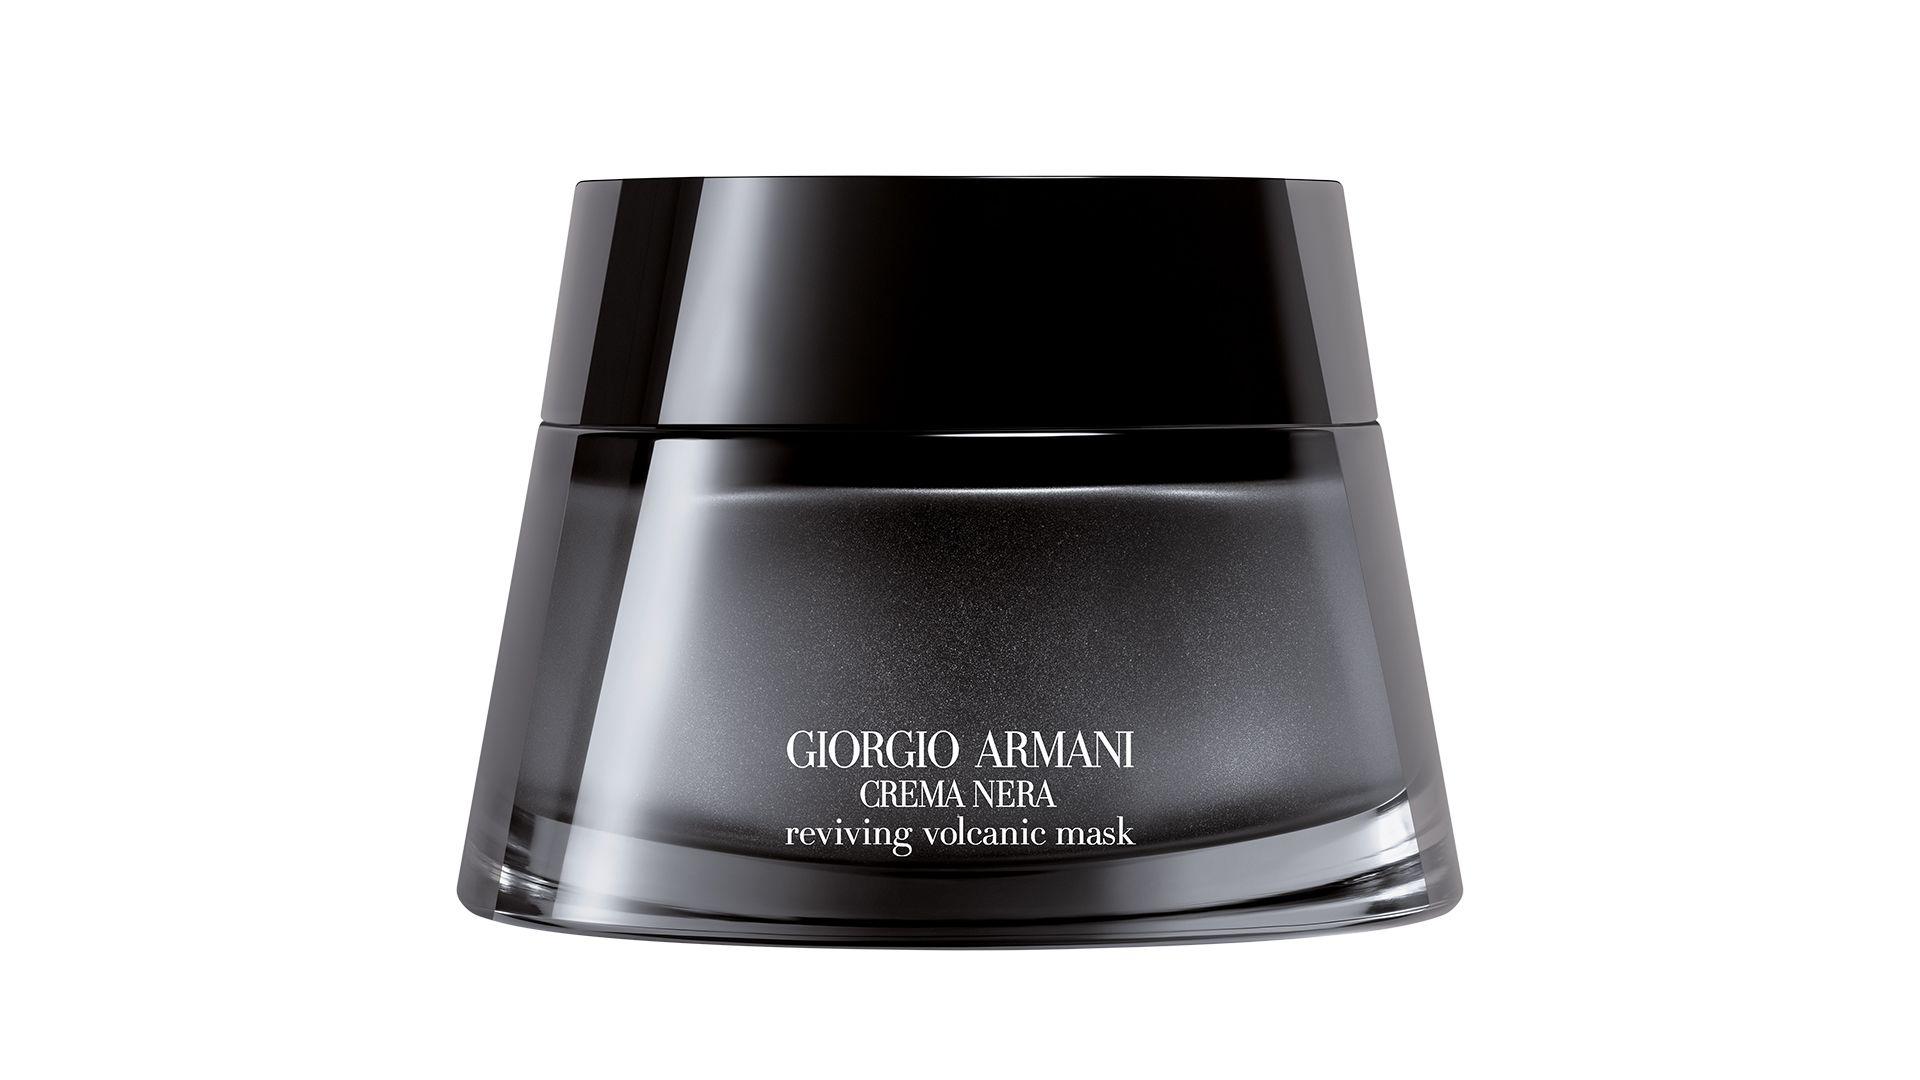 Giorgio Armani – Crema Nera Reviving Volcanic Mask